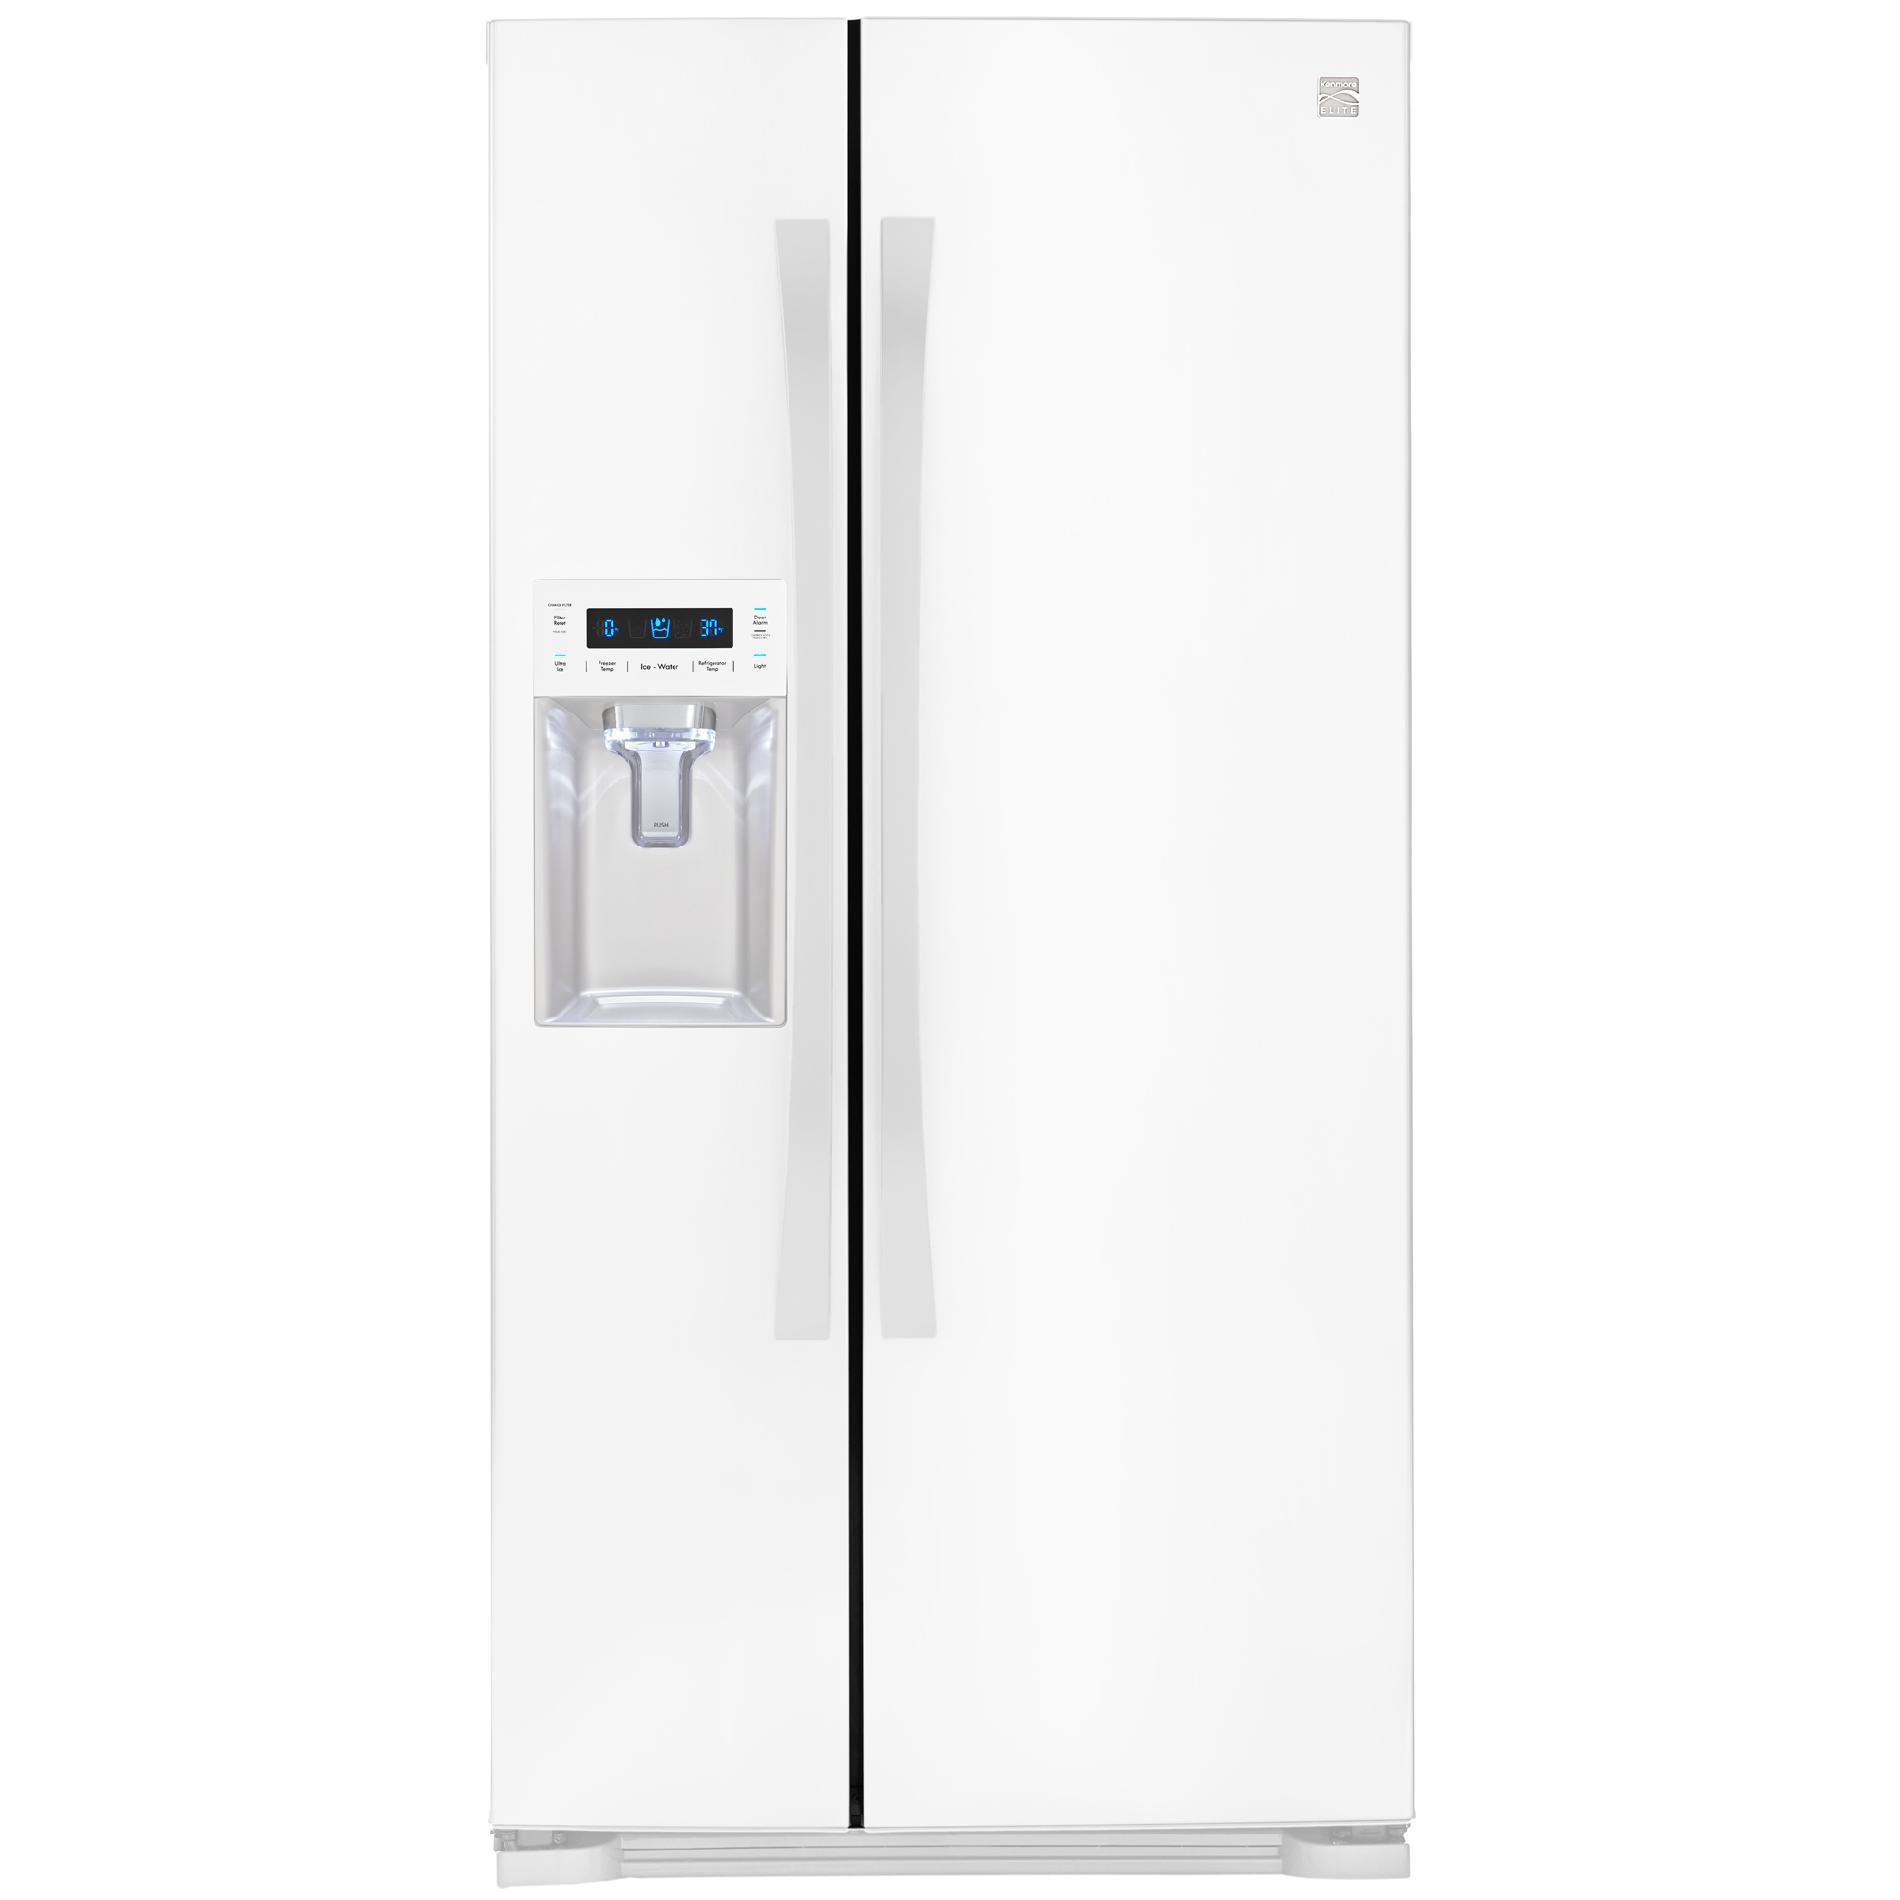 kenmore elite refrigerator model 106.74209402 manual